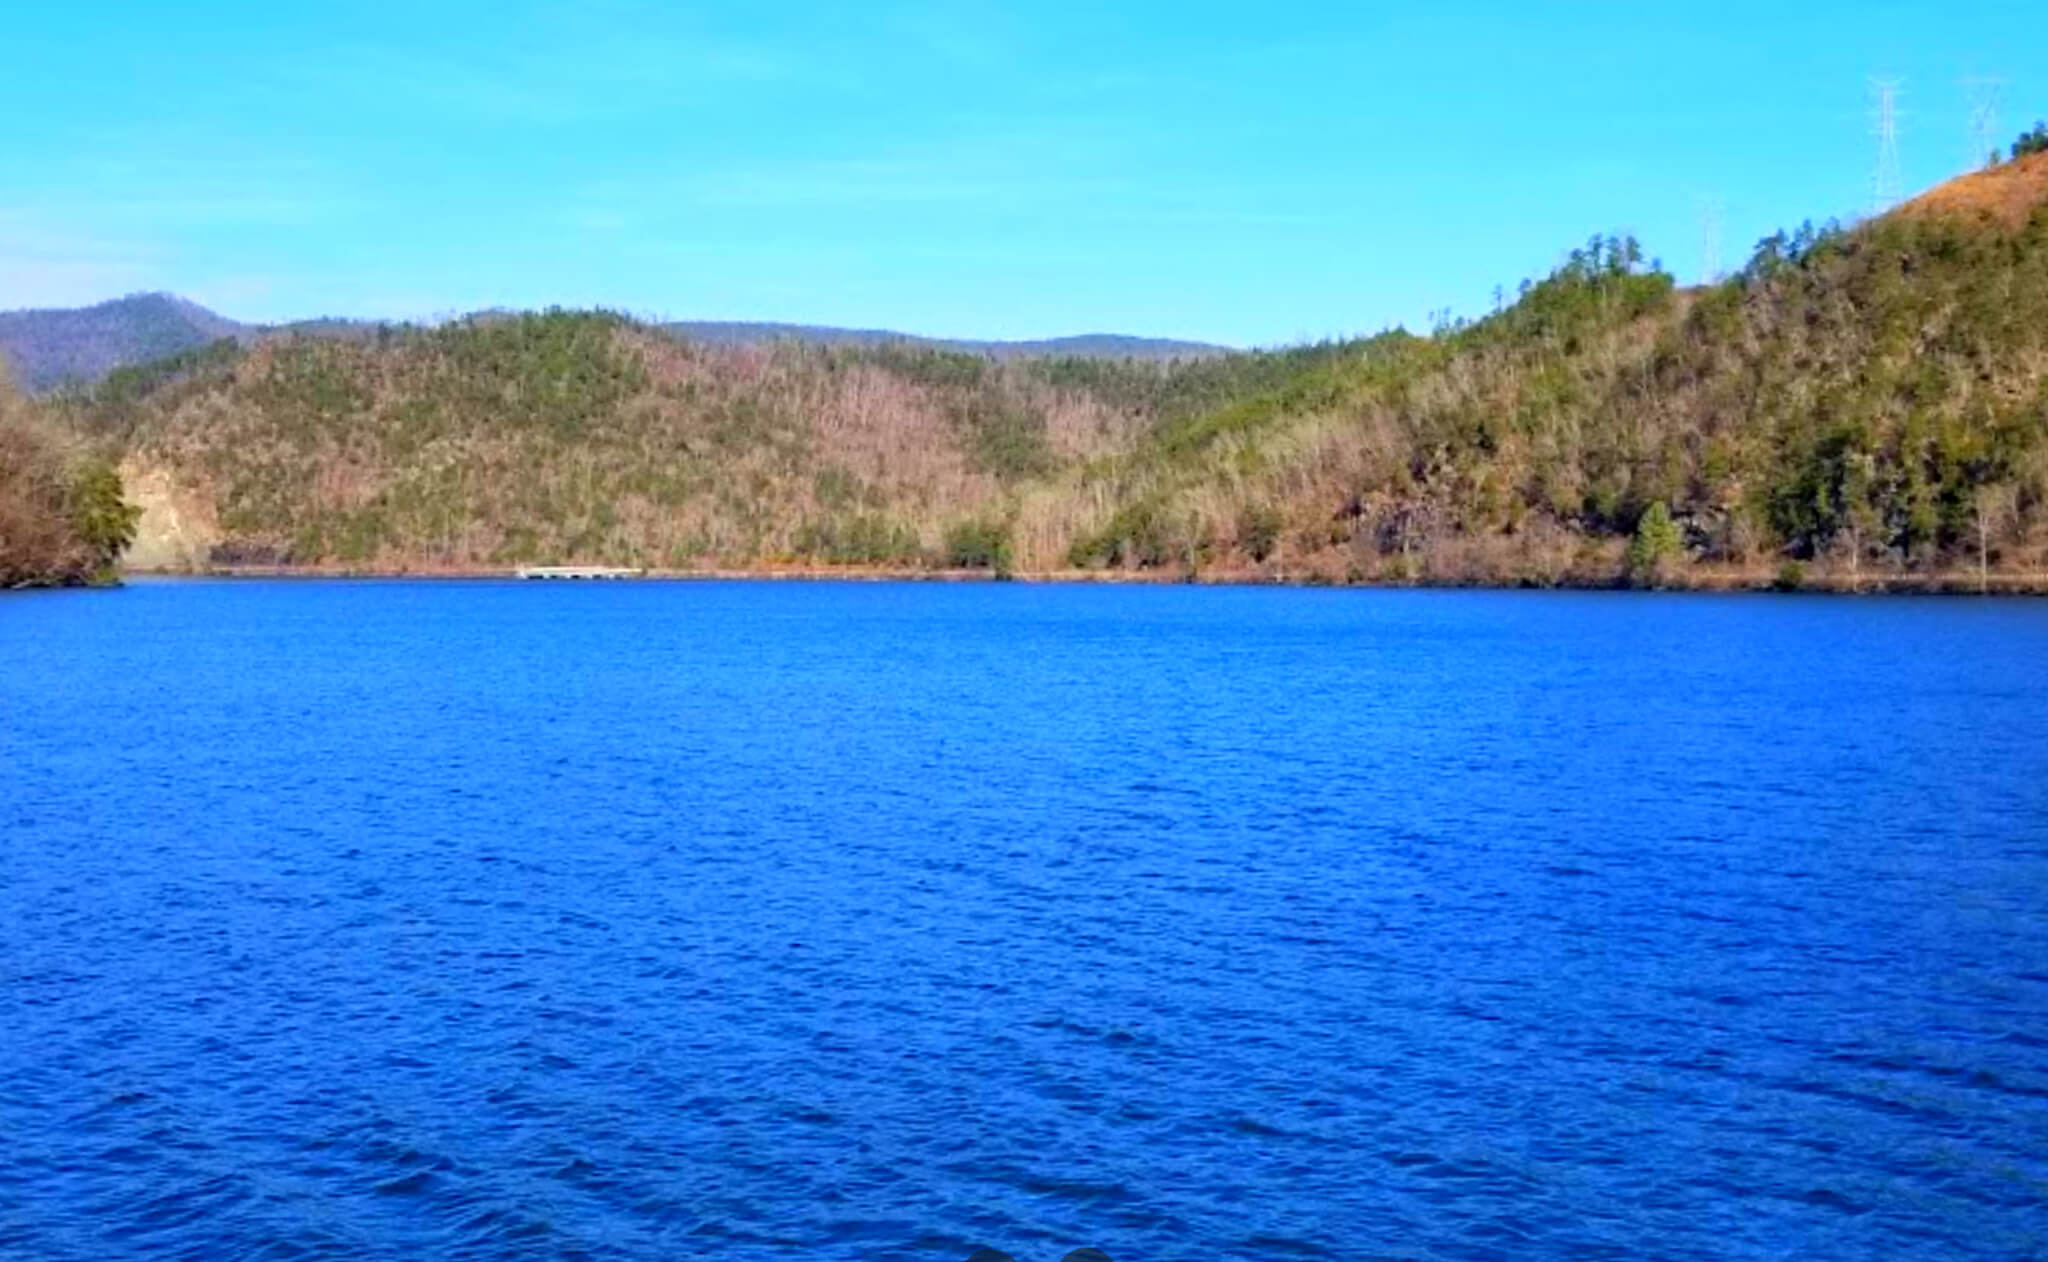 Calderwood-Lake-Fishing-Report-Guide-Tennessee-TN-02